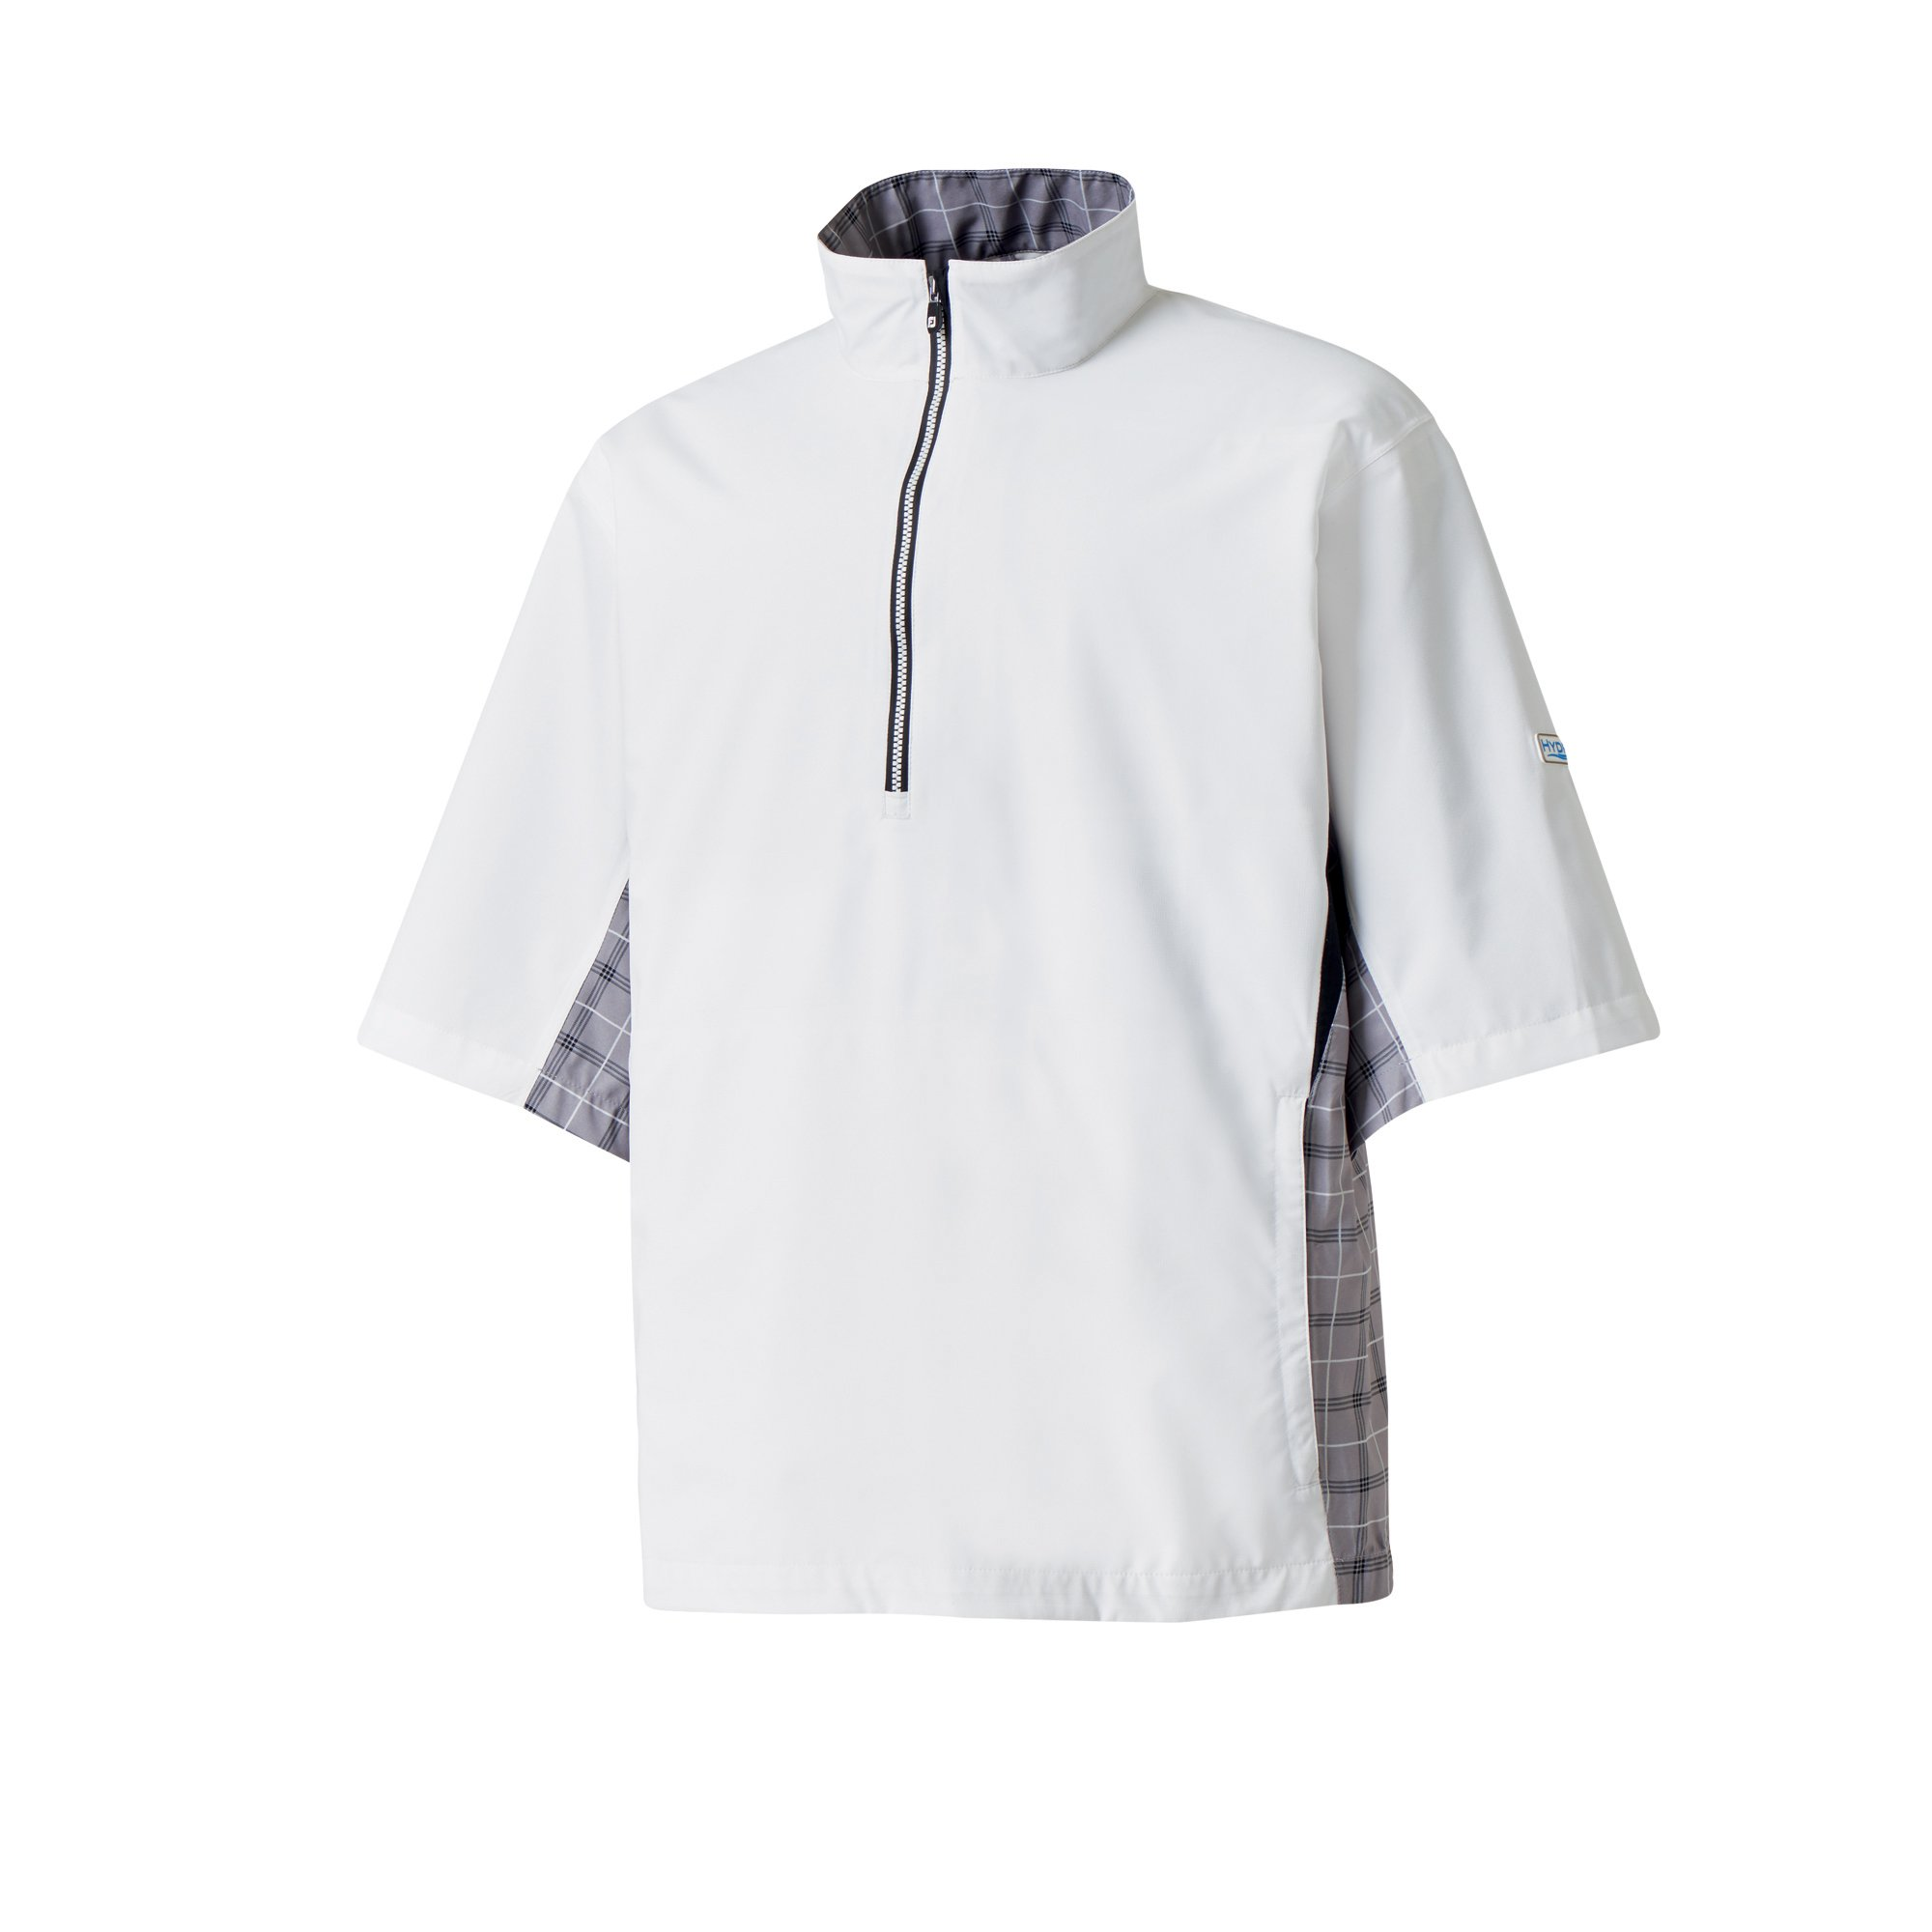 FootJoy Hydrolite Short Sleeve Rain Shirt (White/Grey Check/Black, Large)